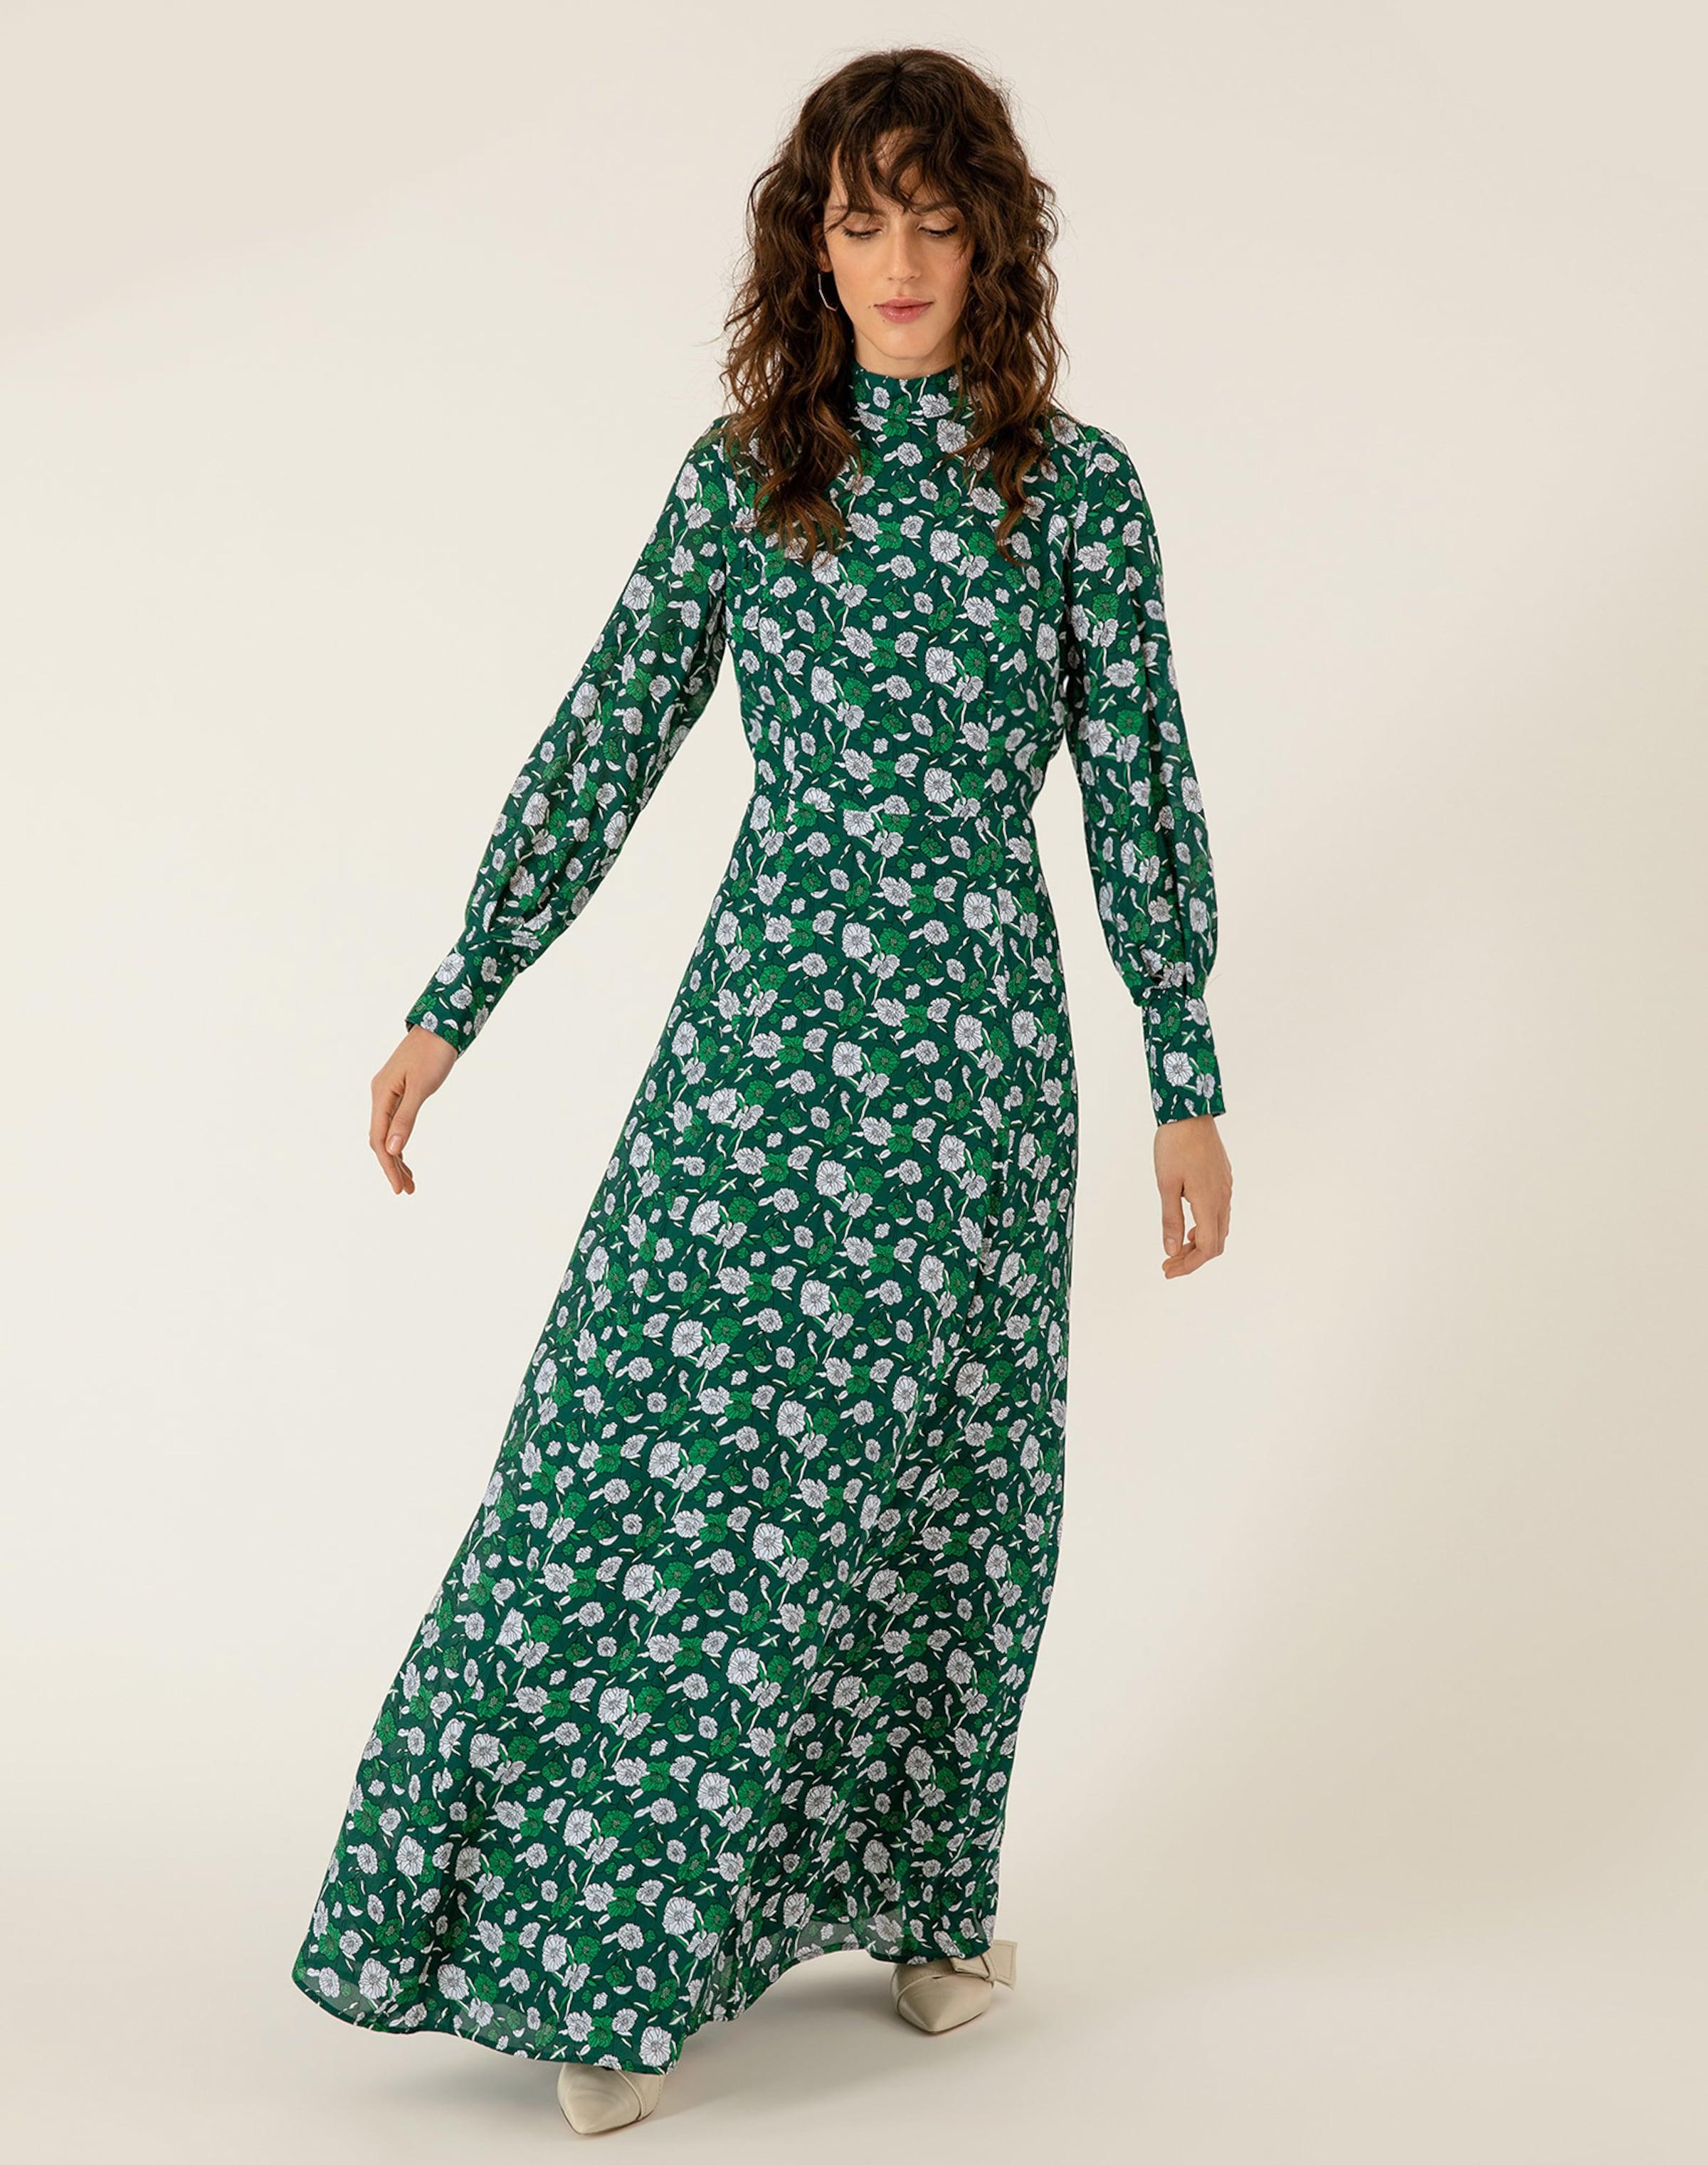 Oak Ivyamp; Couleurs VertMélange Robe En De E2DHY9WI